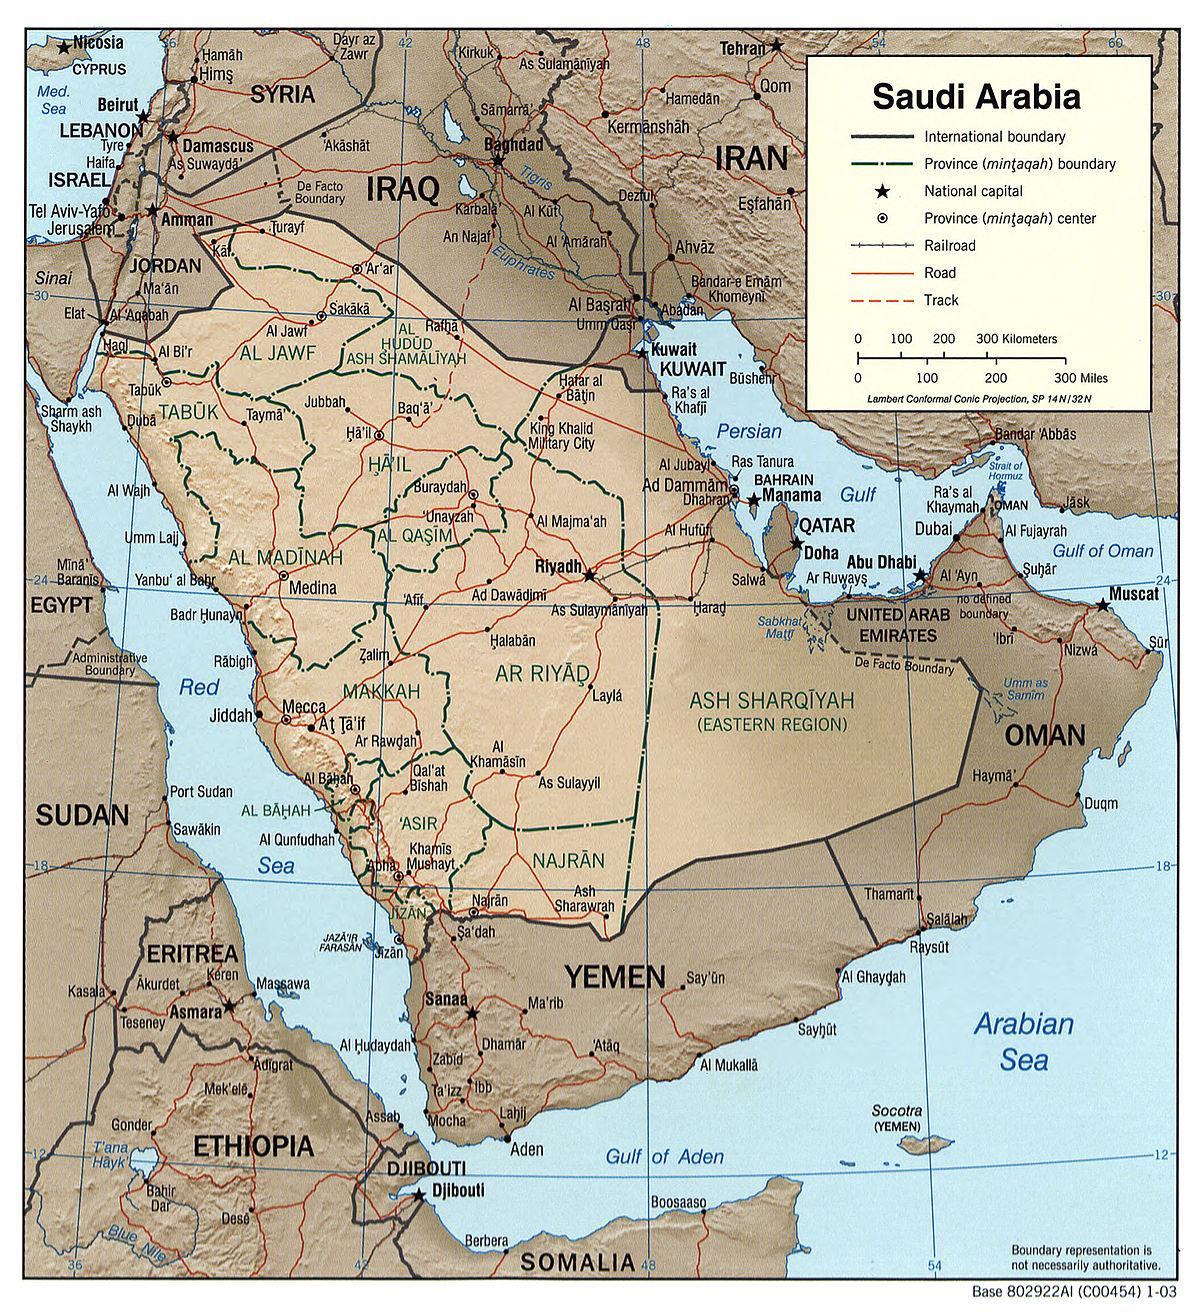 Cartina Asia Occidentale.Arabia Saudita Mappa Fisica Arabia Saudita Geografia Mappa Asia Occidentale Asia